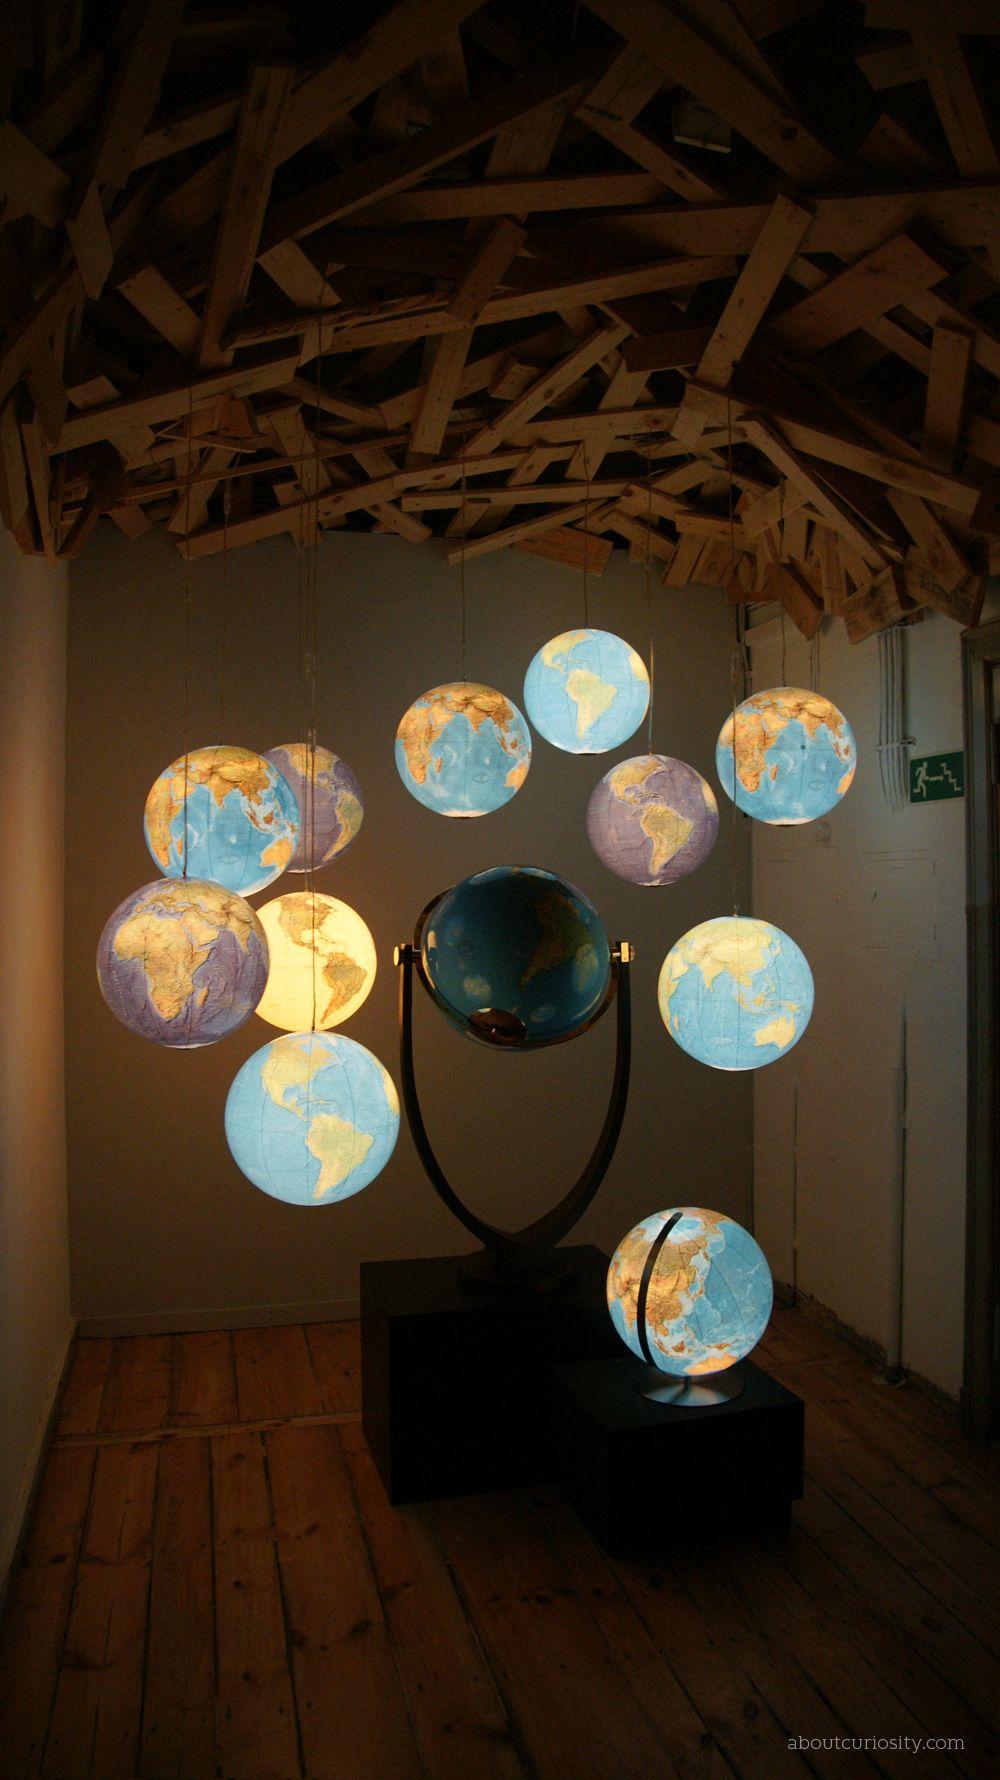 Fantastisk wunderschön | ::: Nostalgie ::: | Vintage Globus, Globus lampe und MN09